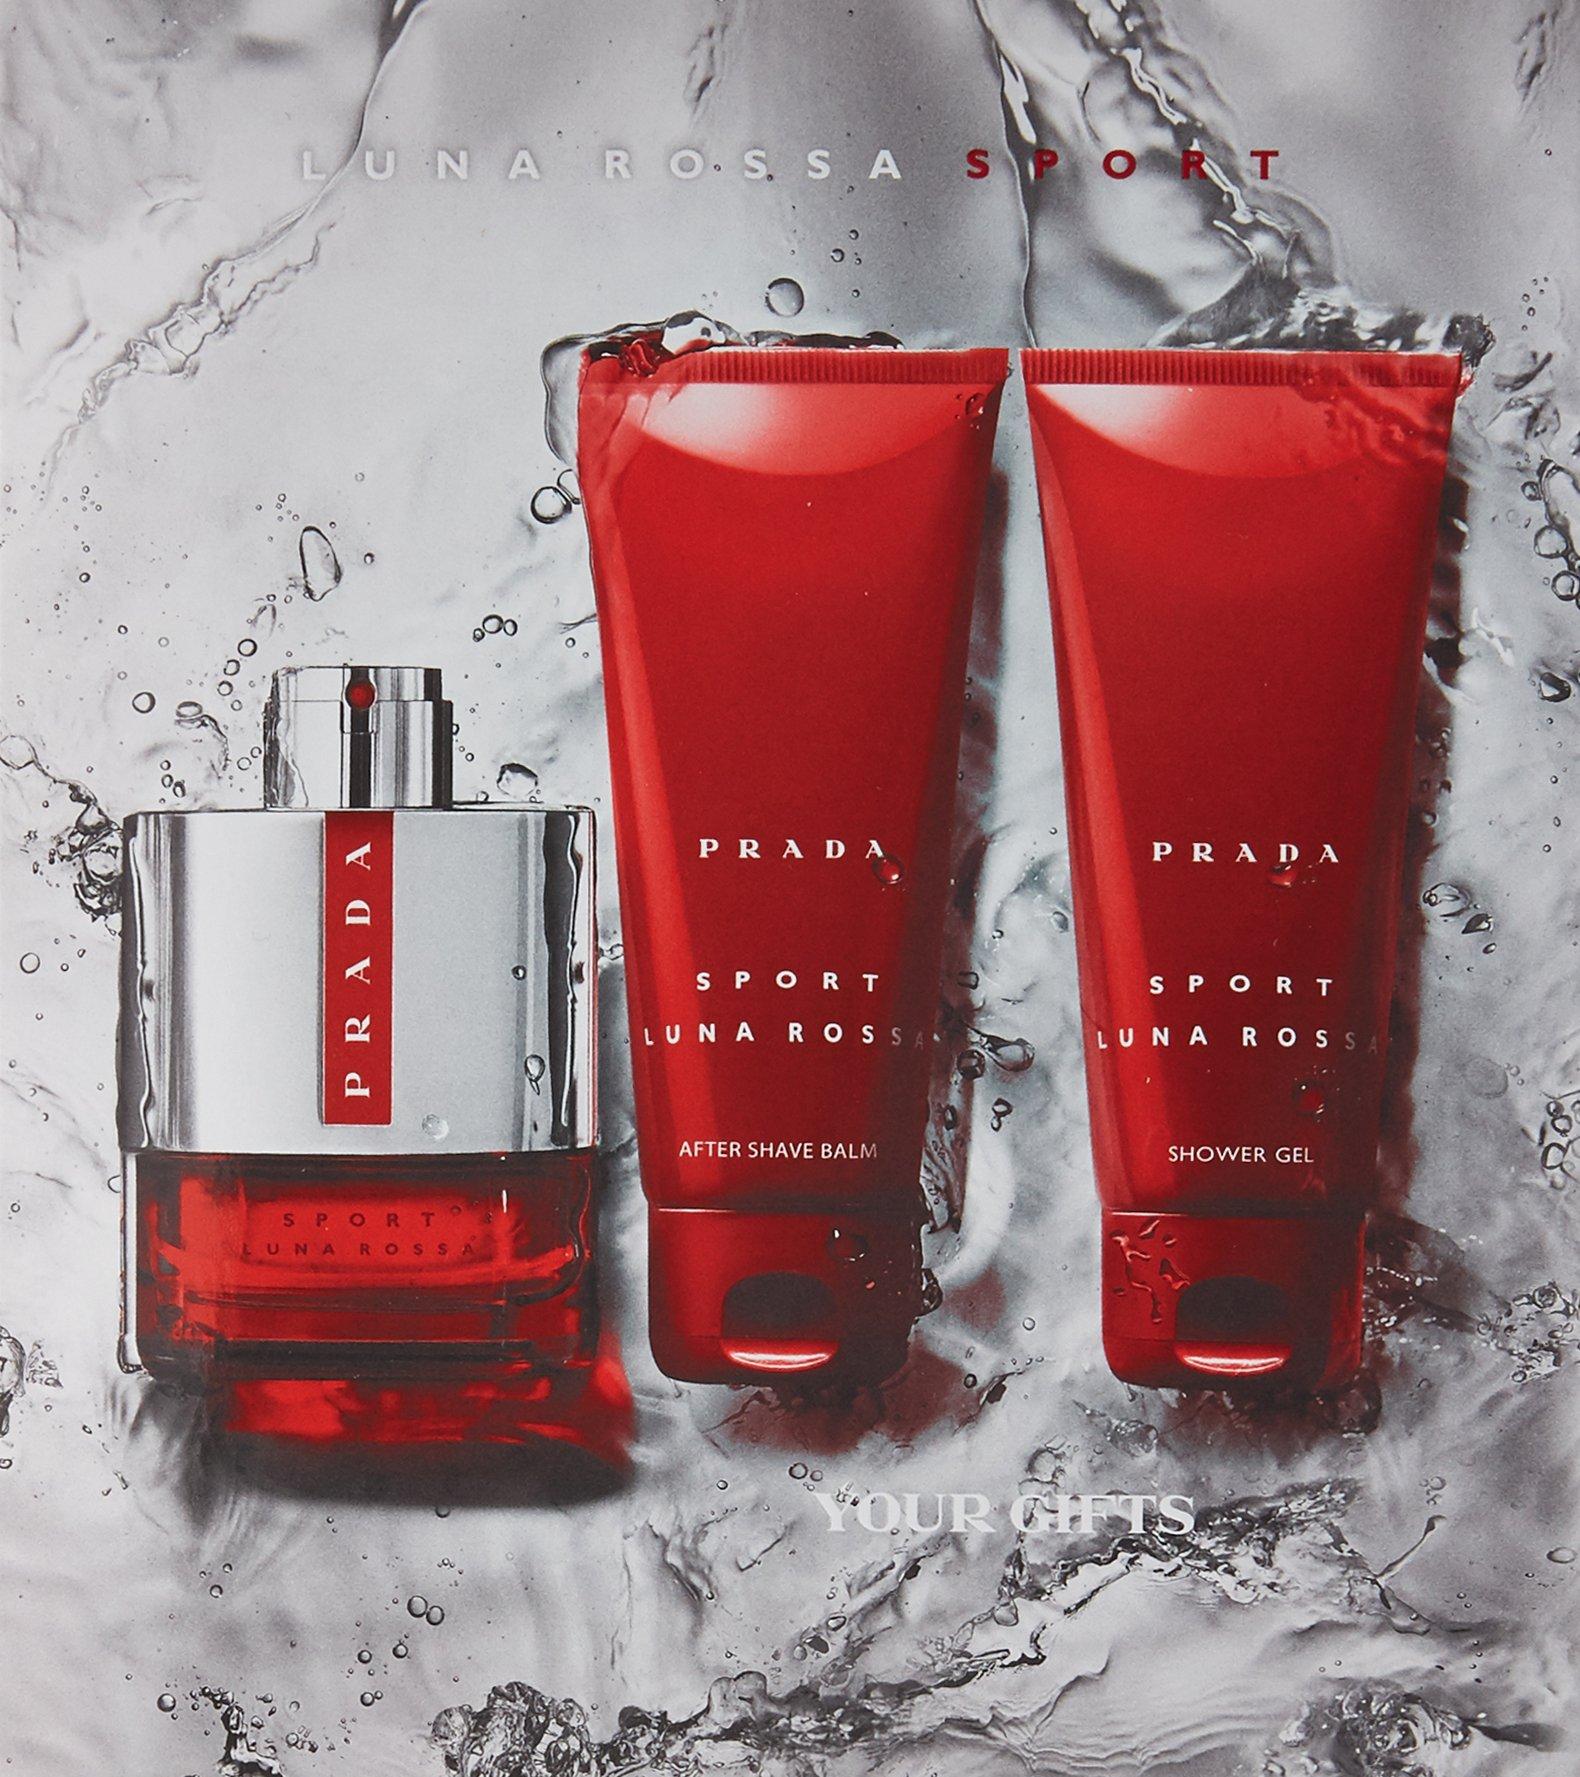 Prada Luna Rossa Sport for Men 3 PC (3.4 Eau De Toilette / 3.4 shower gel / 3.4 after shave balm) by Prada (Image #3)